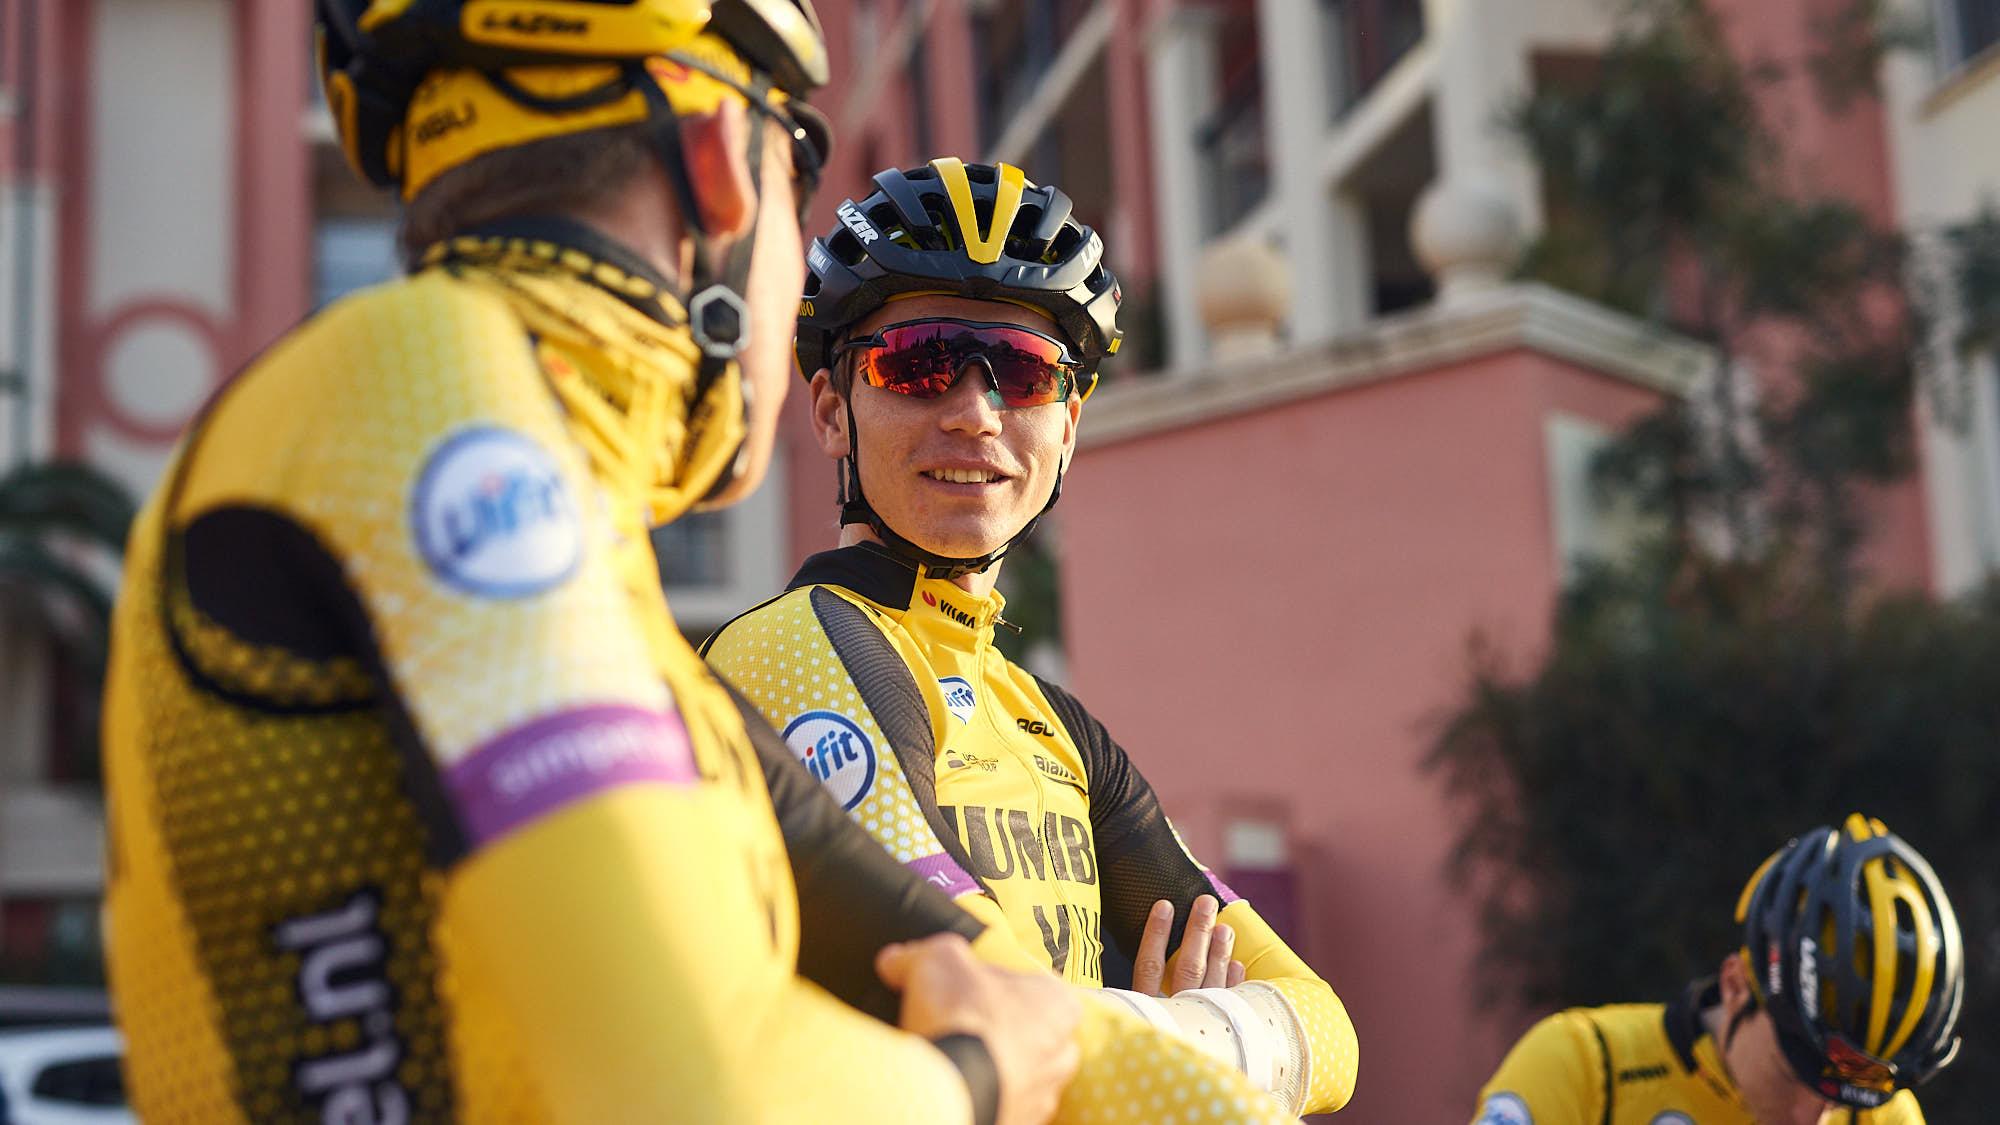 Jumbo-Visma's Norwegian cyclist Amund Grøndahl Jansen before training in Alicante